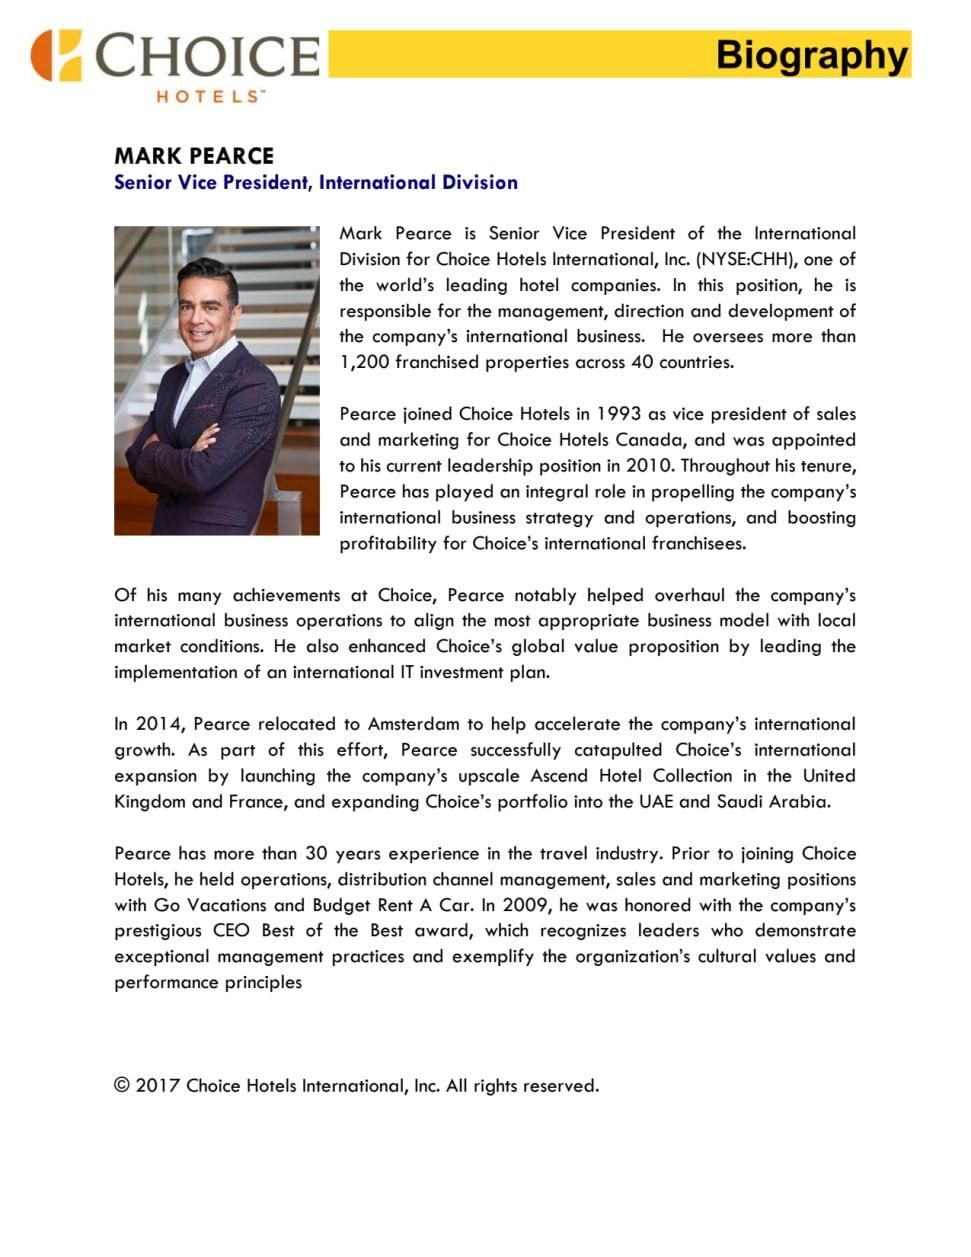 Biography, Mark Pearce, Senior Vice President International